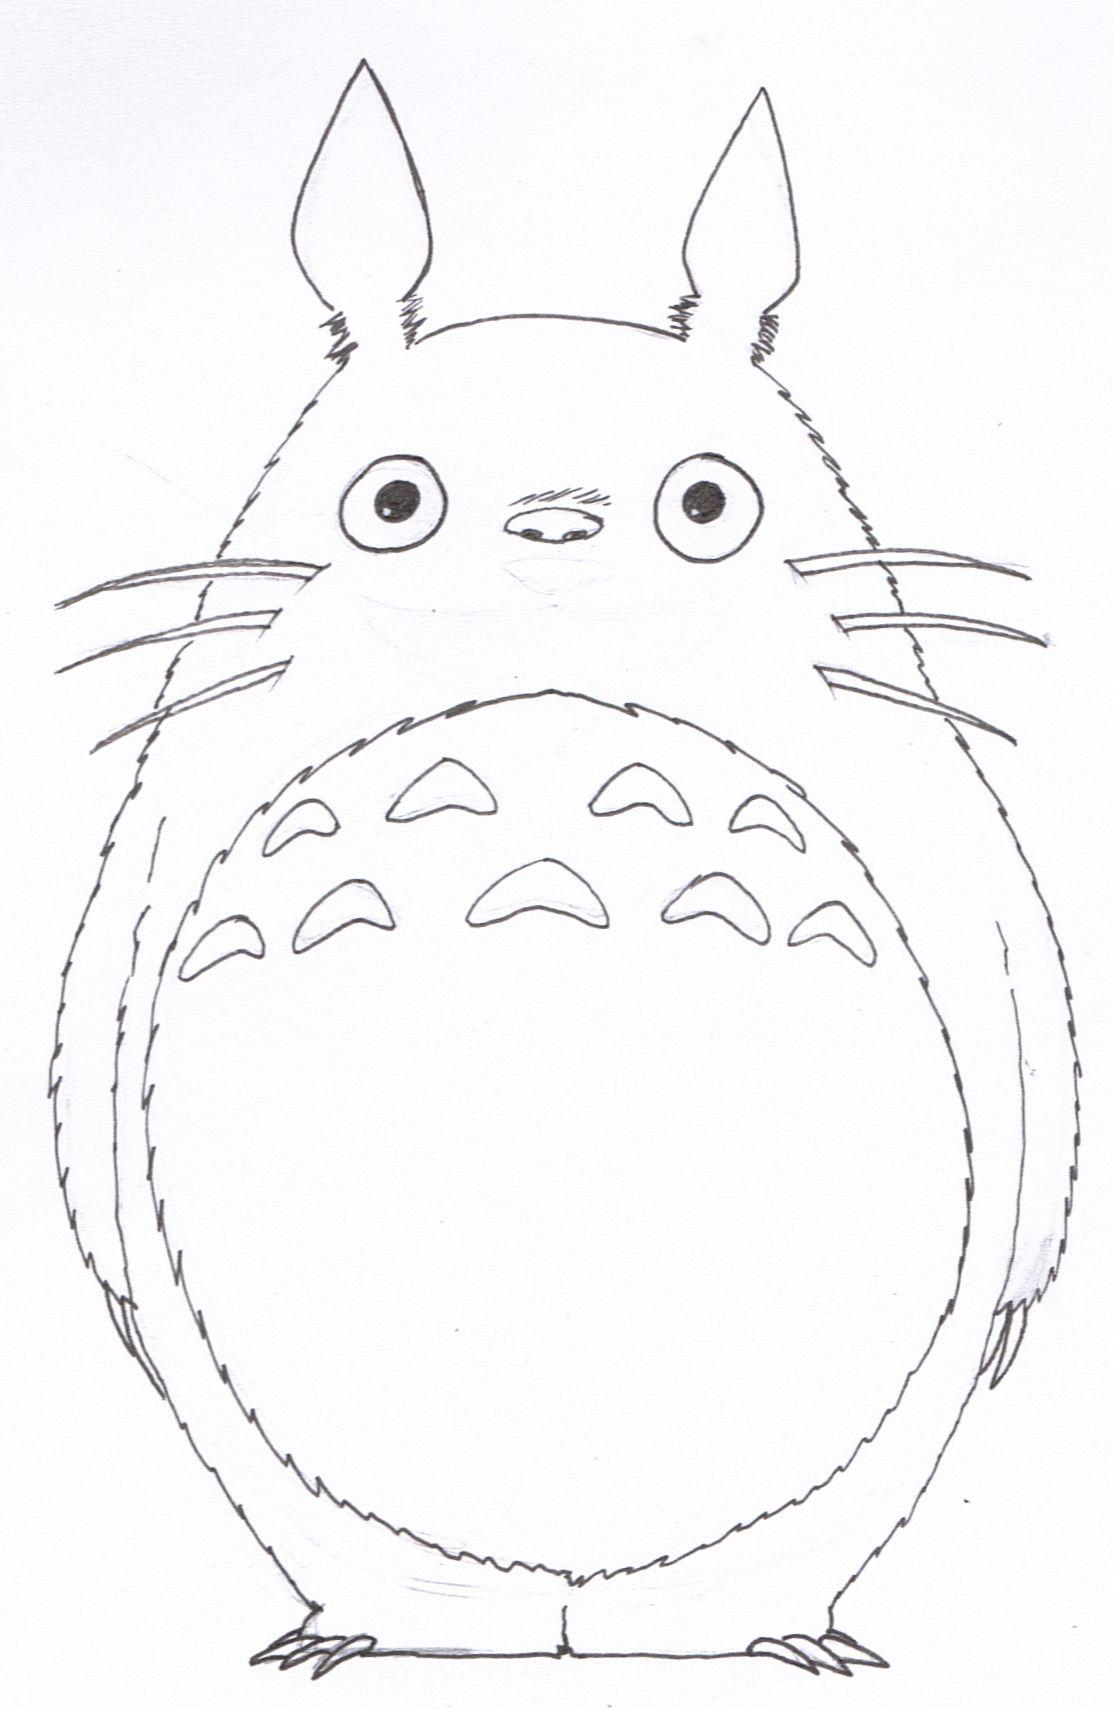 Orig03 Deviantart Net 42b0 F 2013 168 4 B Lineart Totoro By Silveru121 D69isz9 Jpg Totoro Drawing Totoro Studio Ghibli Art [ 1709 x 1113 Pixel ]